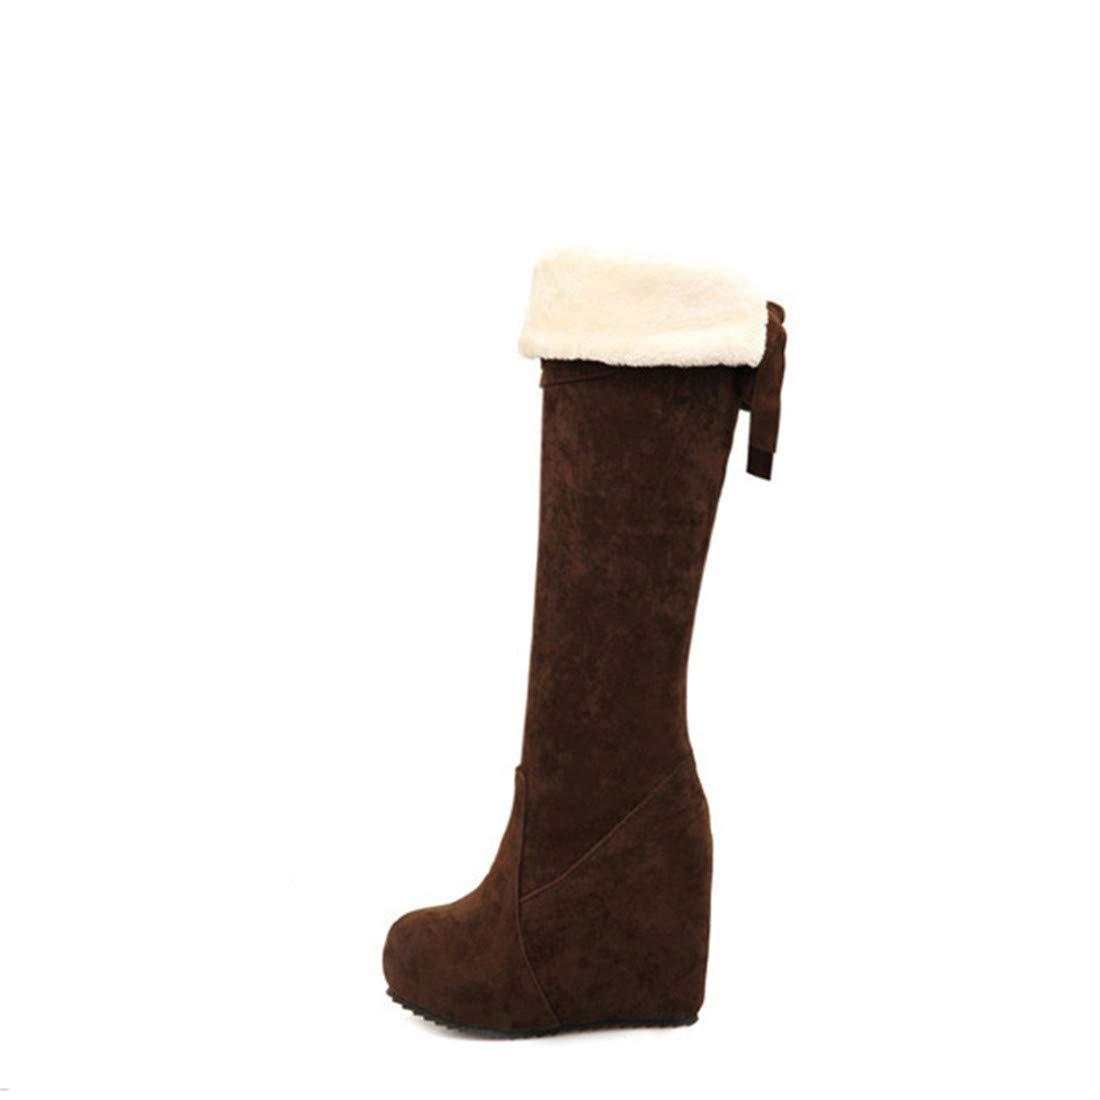 Sandalette-DEDE la Moda degli Stivali, Stivali Stivali Stivali Alti, Stivali Alti, Stivali Alti,Marrone,41 709c00